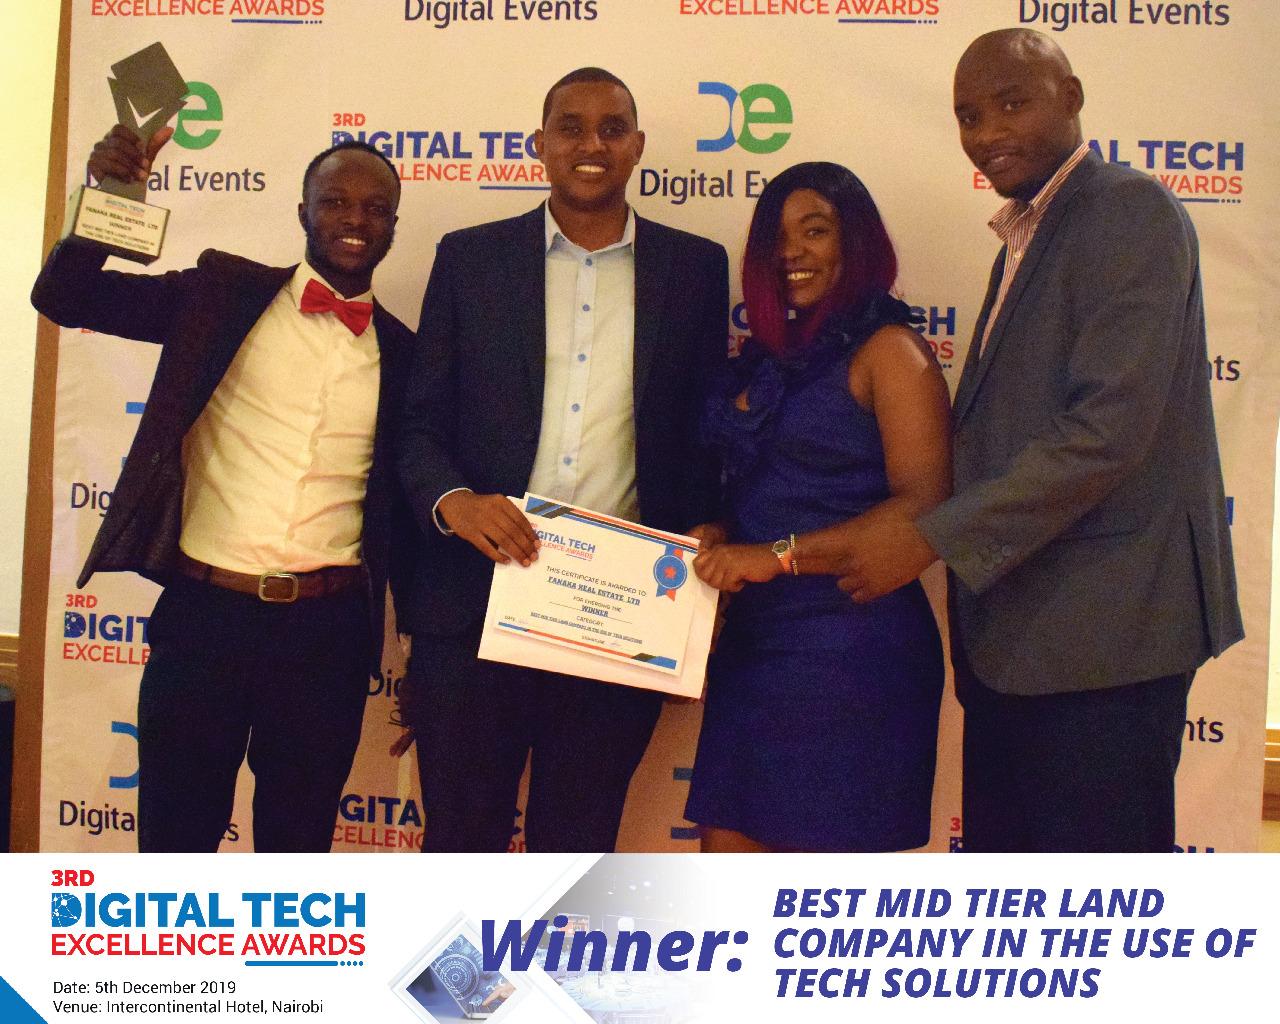 Fanaka Real Estate Wins Award for affordable plots www.businesstoday.co.ke